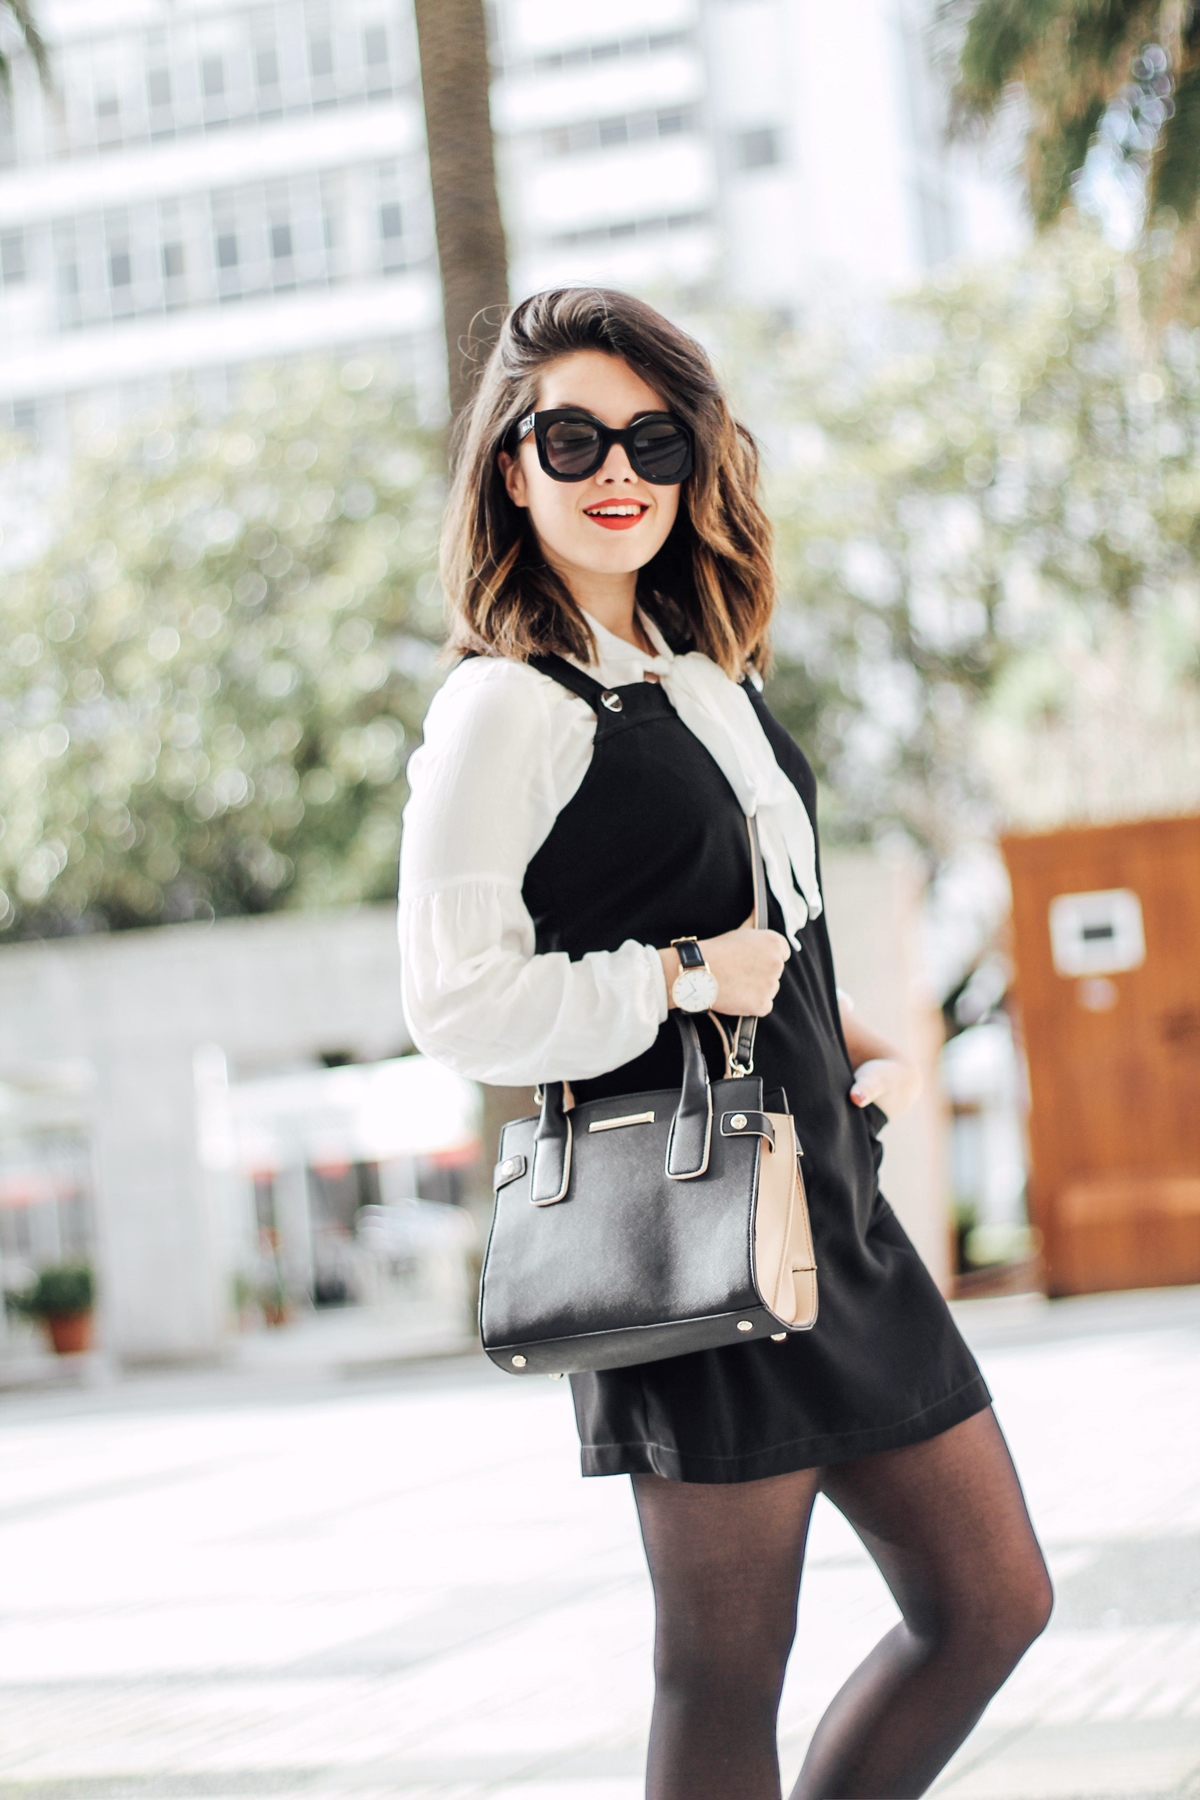 styleheroes-dorothy-perkins-pinafore-dress-baby-marta-celine-sunglasses-myblueberrynightsblog